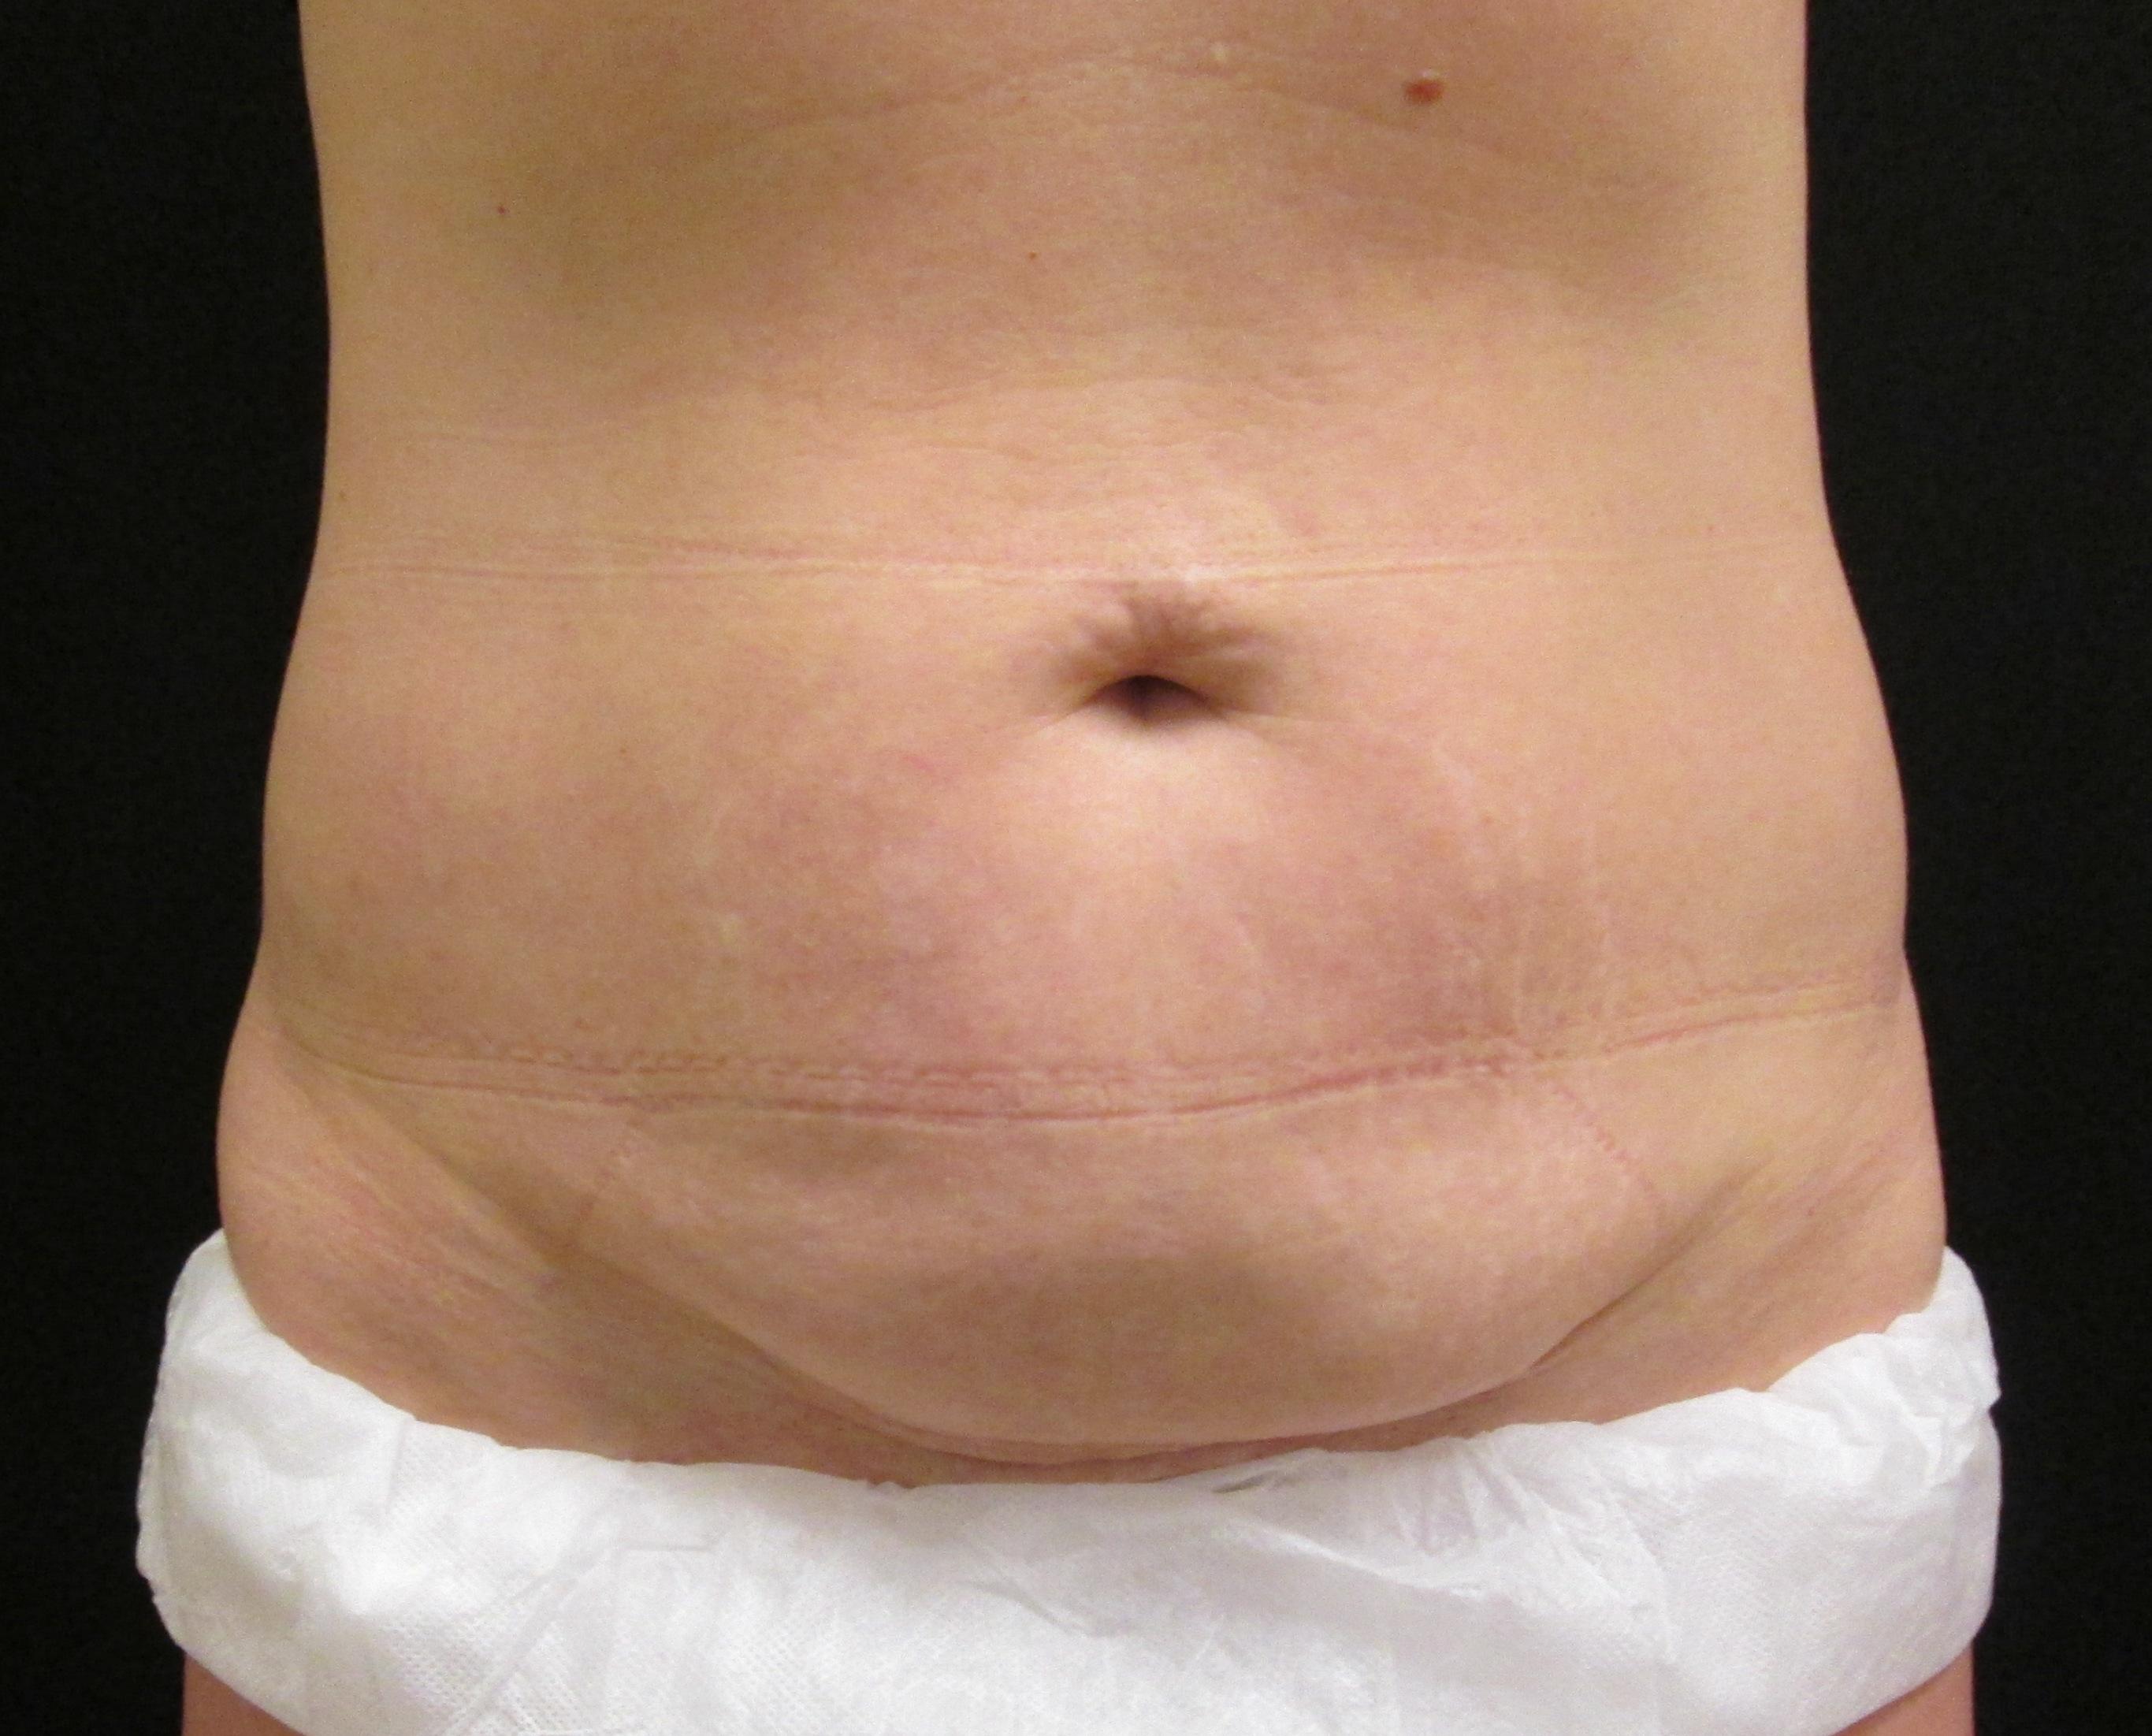 coolsculpting tummy tuck alternative bridgeport fairfield connecticut jandali plastic surgery